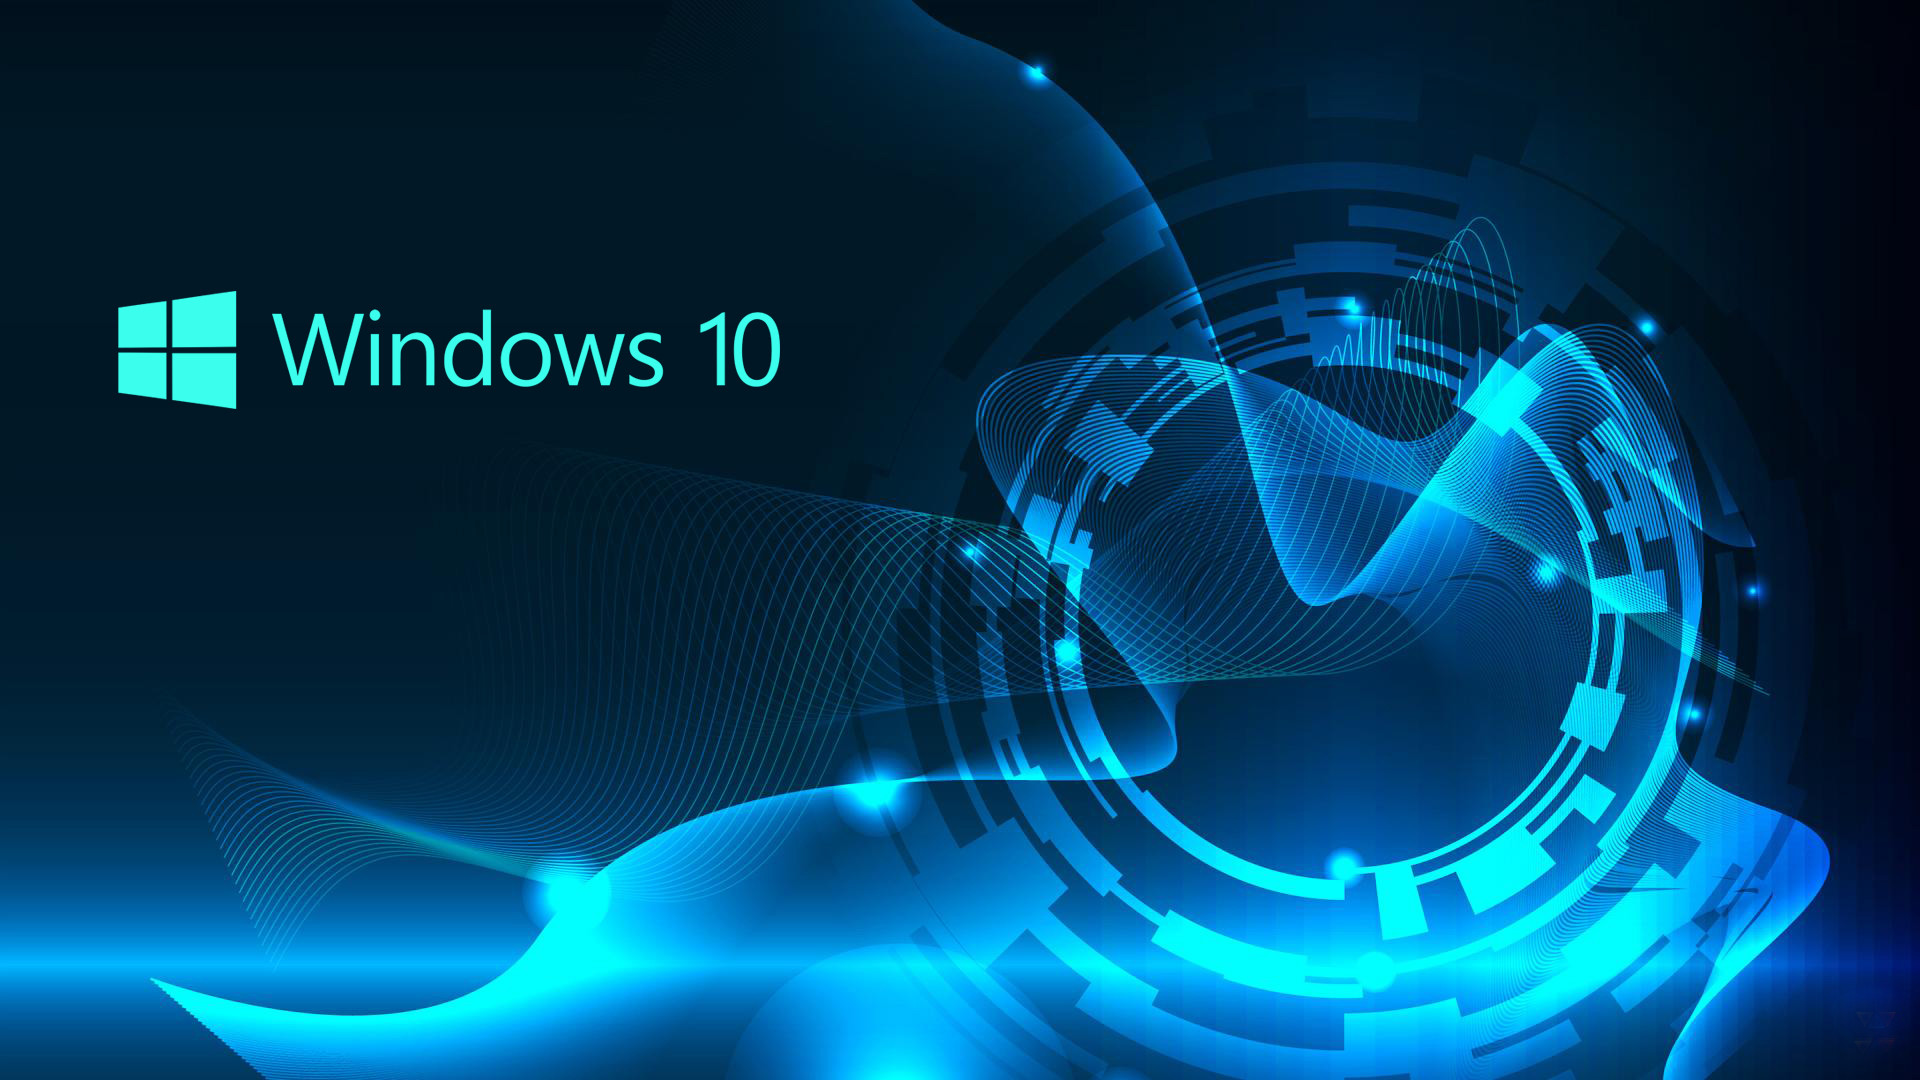 Hp Wallpaper Windows 10 85 Images